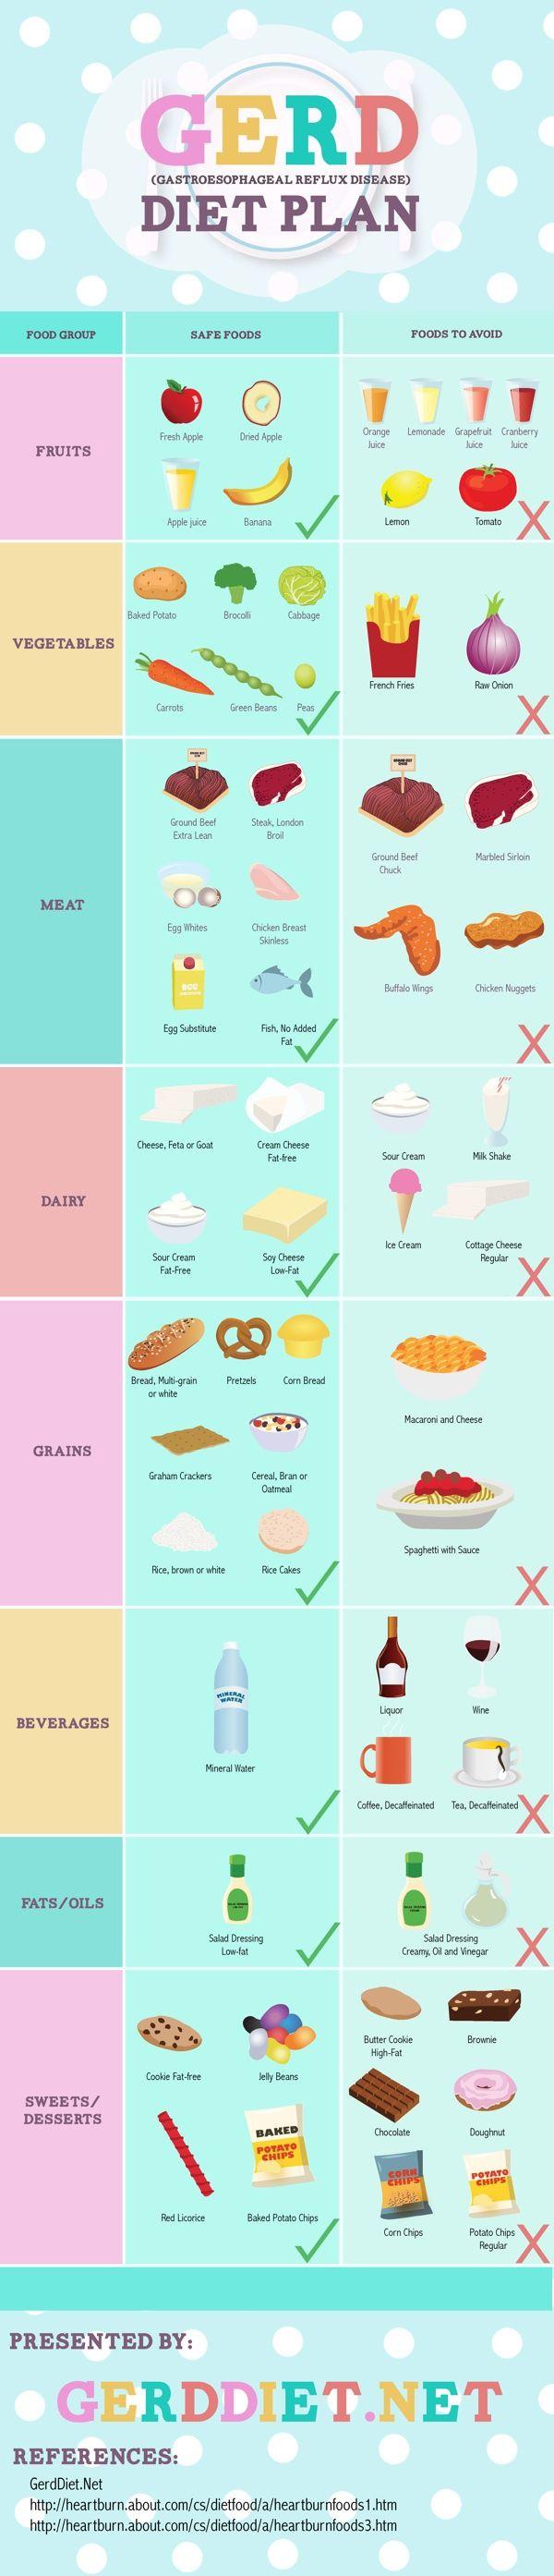 GERD Diet Plan (Infographic) by Stel de Vera, via Behance — Not only do I appre                                                                                                                                                      More